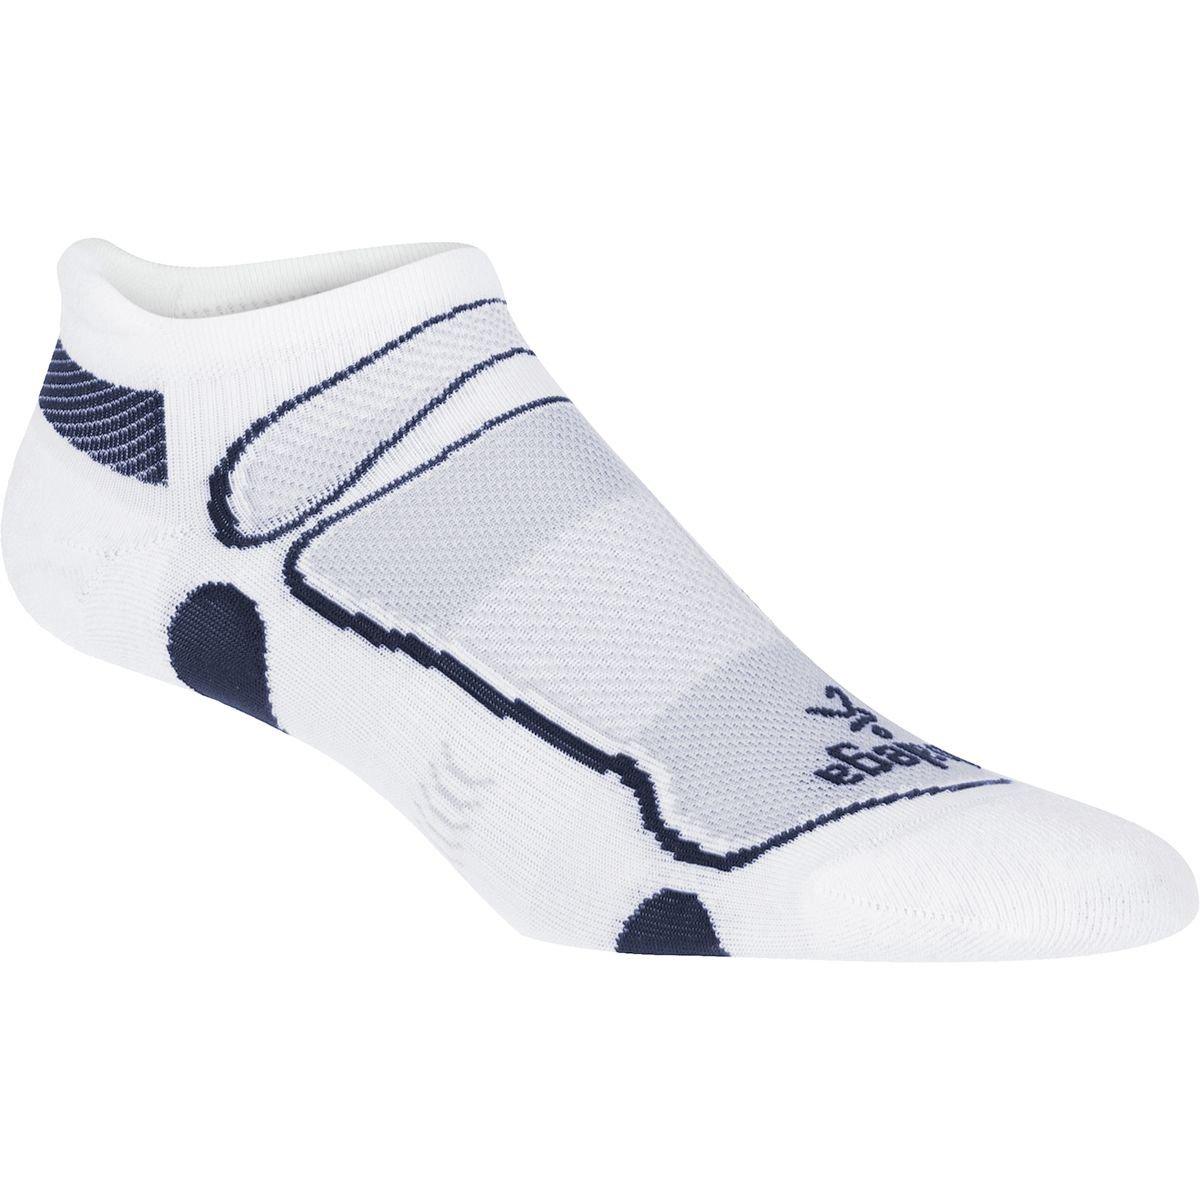 Balega Ultra Light No Show Running Socks (medium, White/Navy)